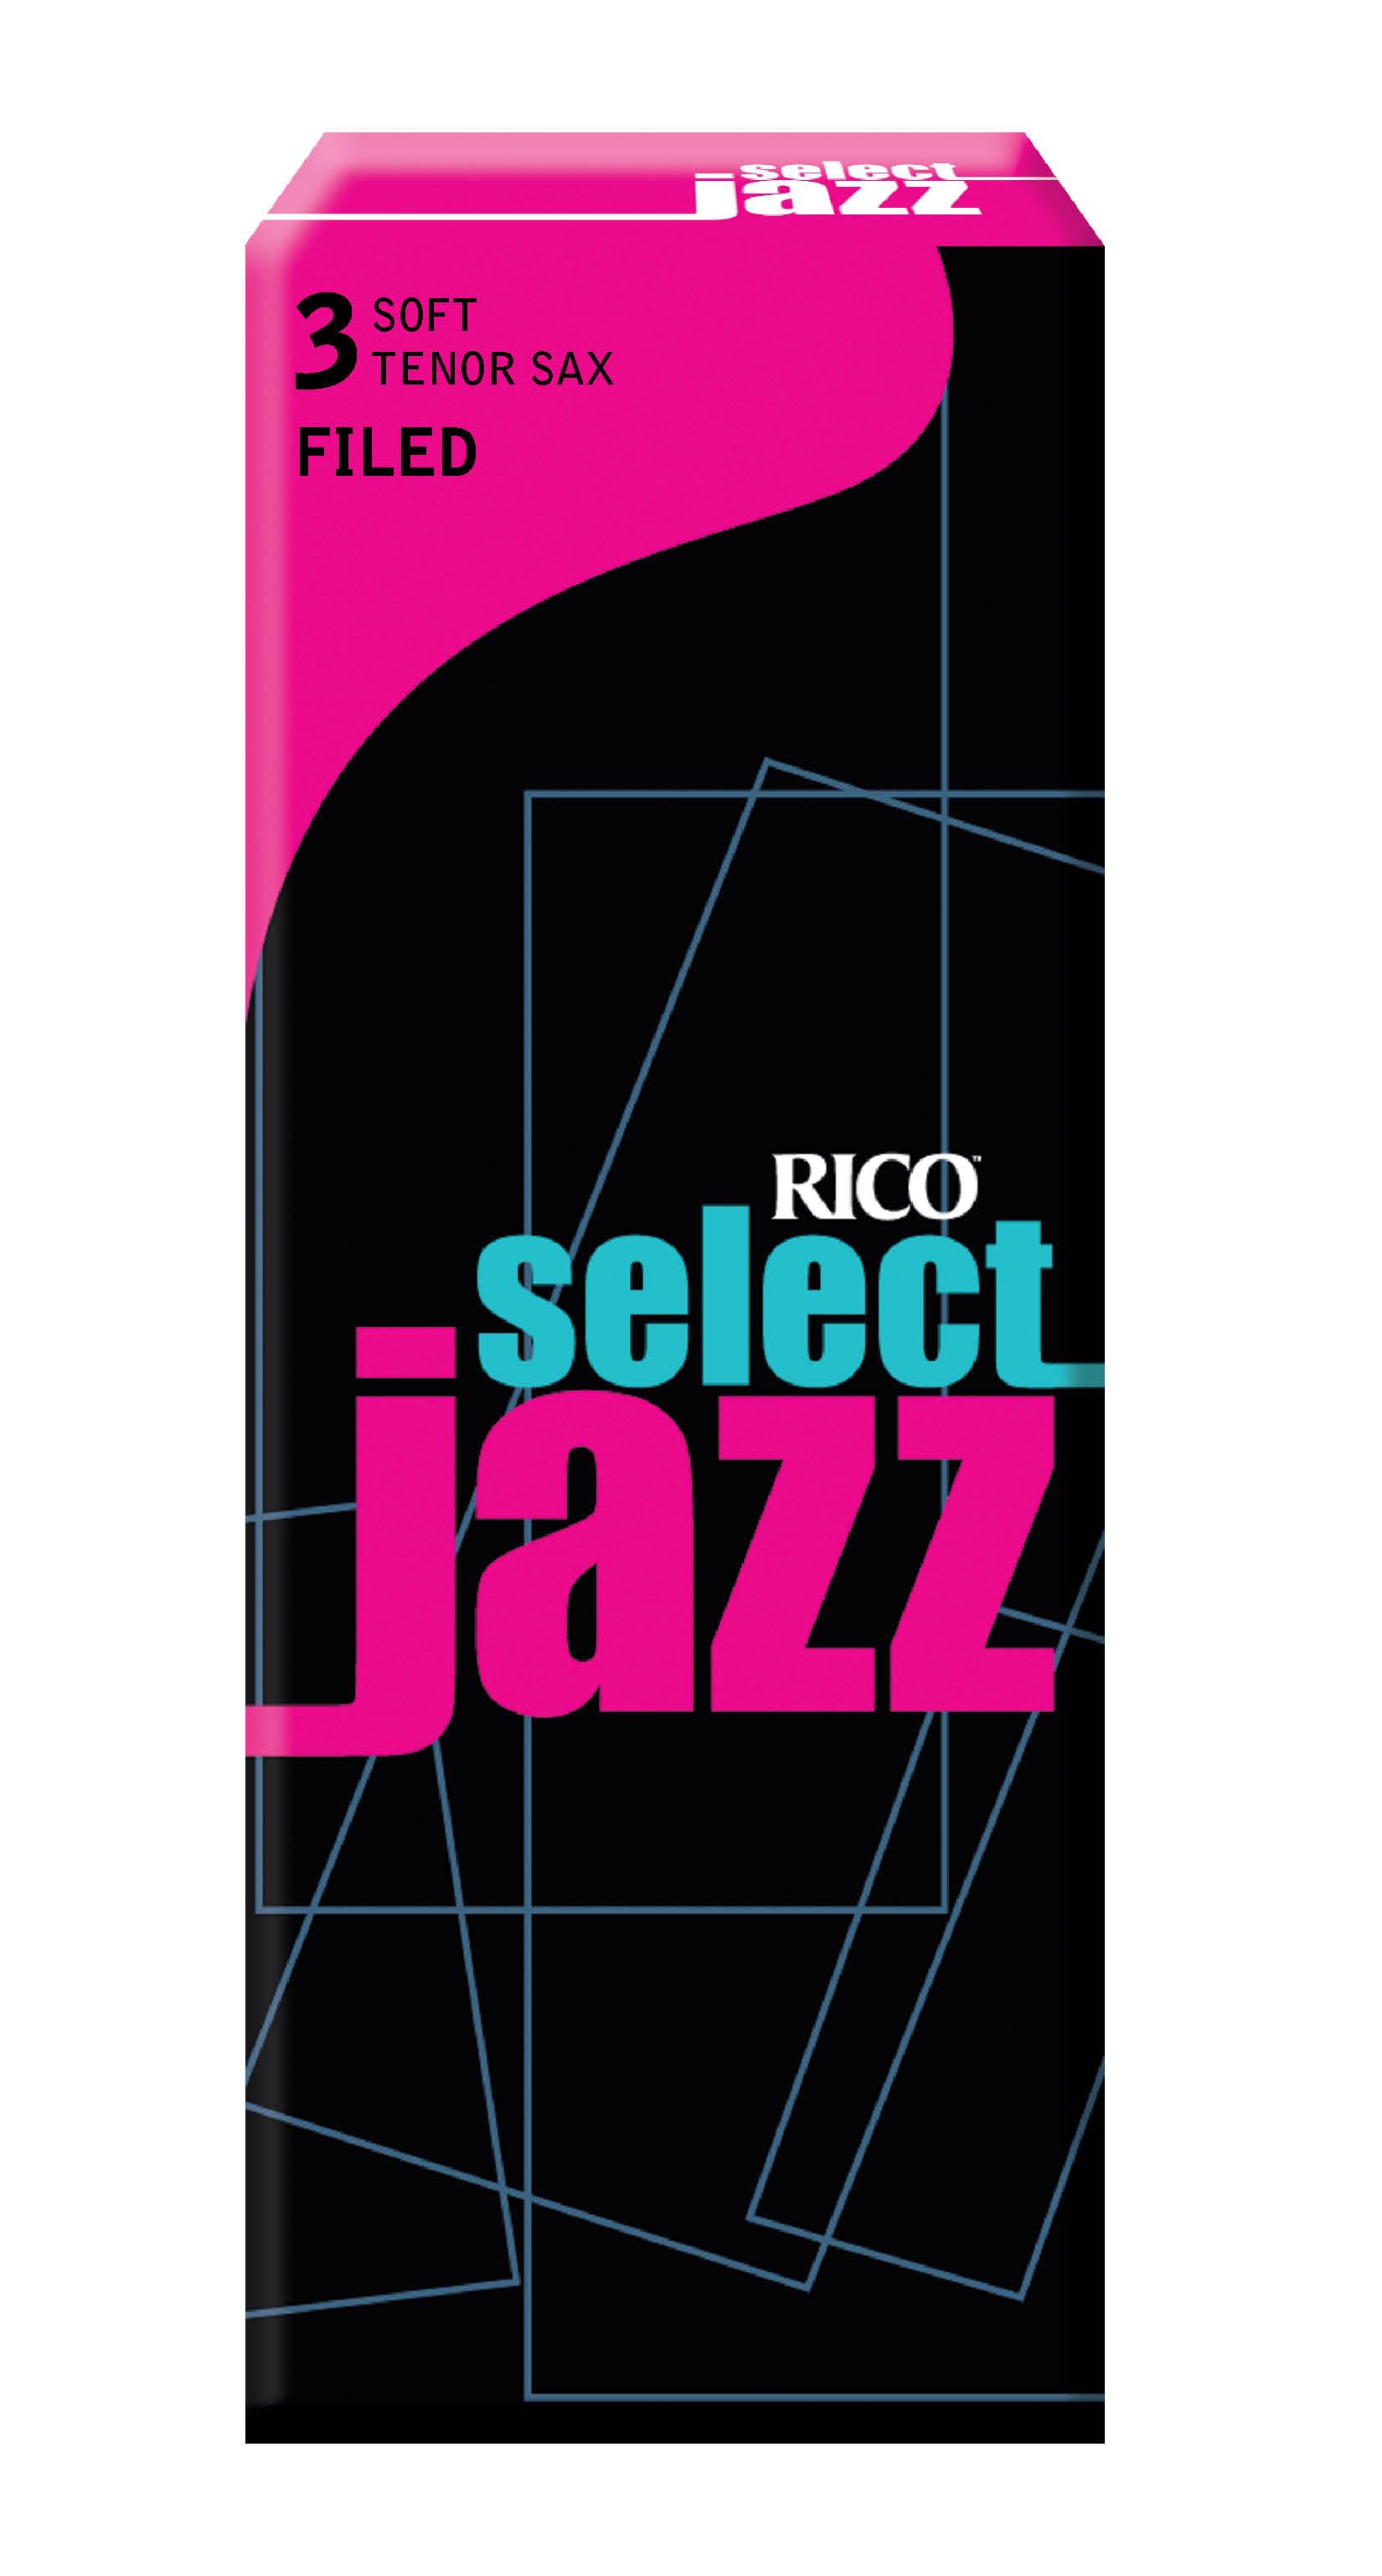 Reed--tenor Sax  Rico Sj Filed